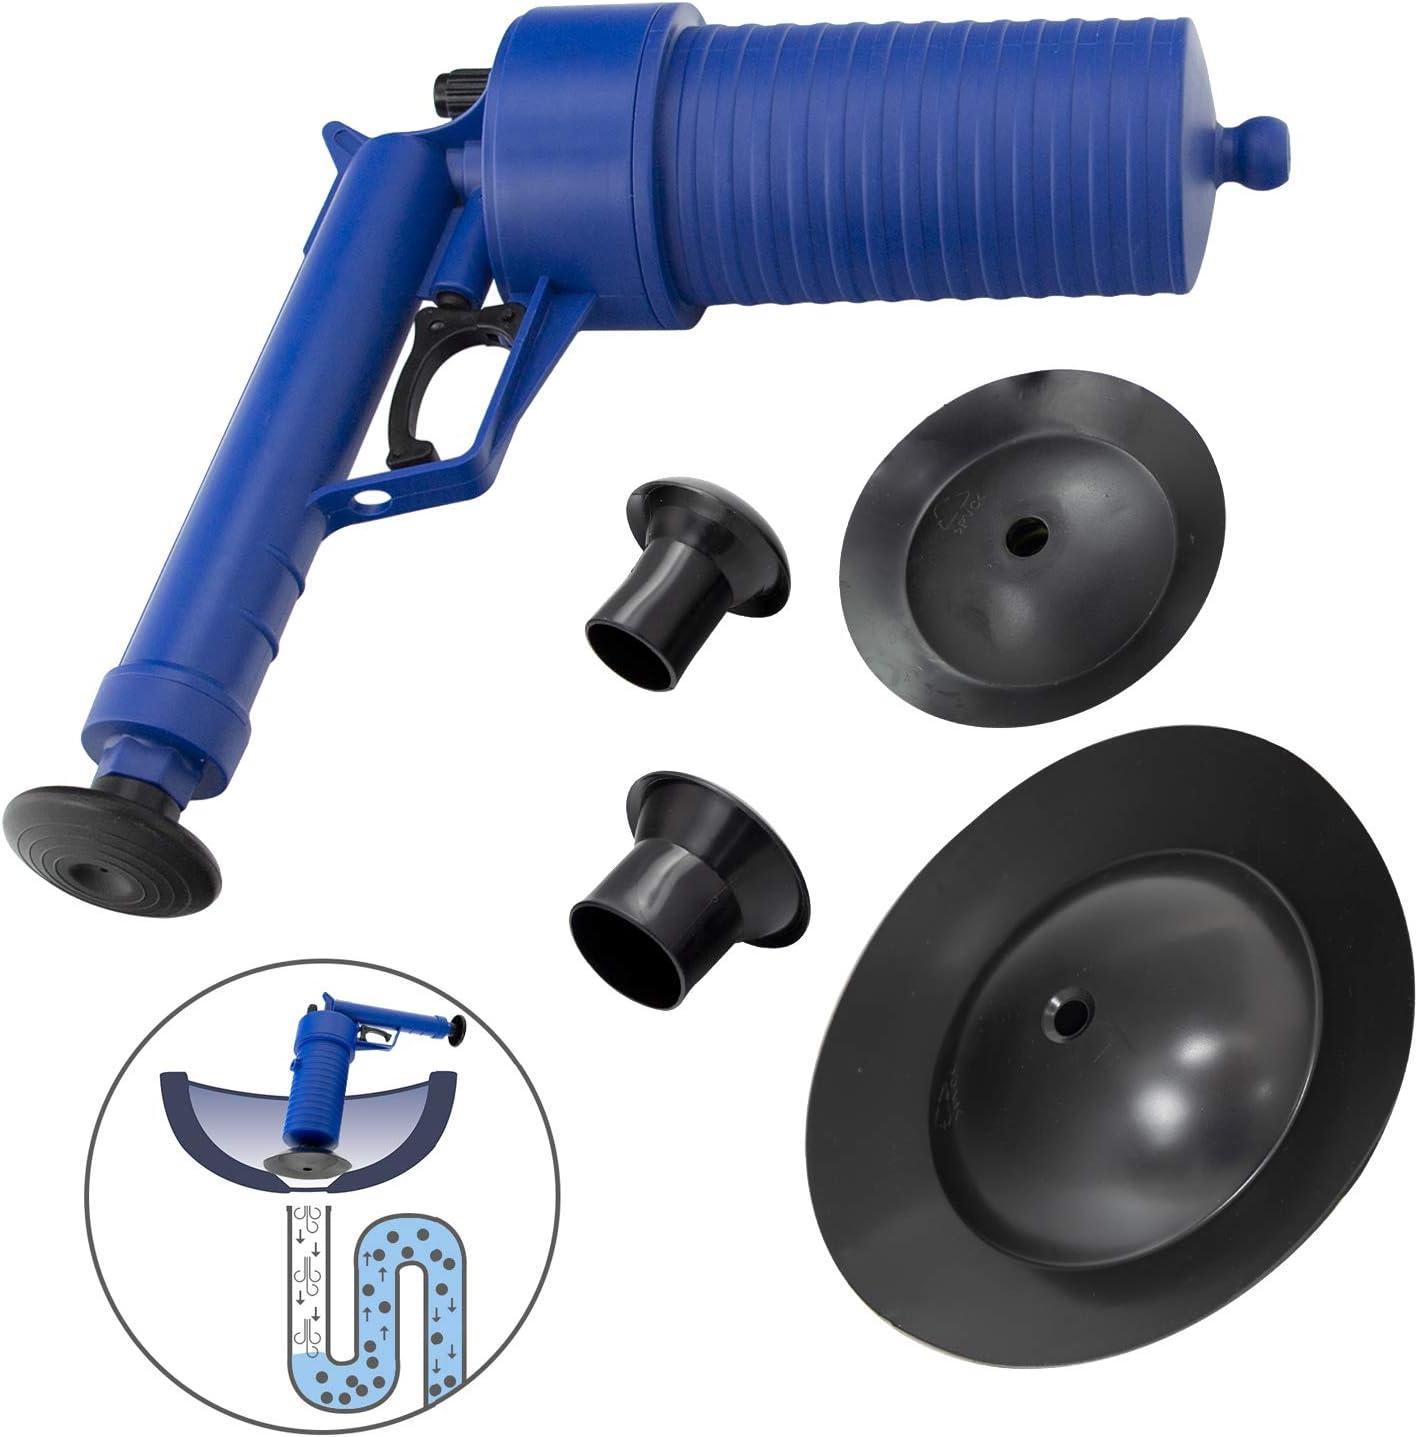 WOLFPACK LINEA PROFESIONAL 2660120 Desatascador Profesional Pistola Con Aire Comprimido